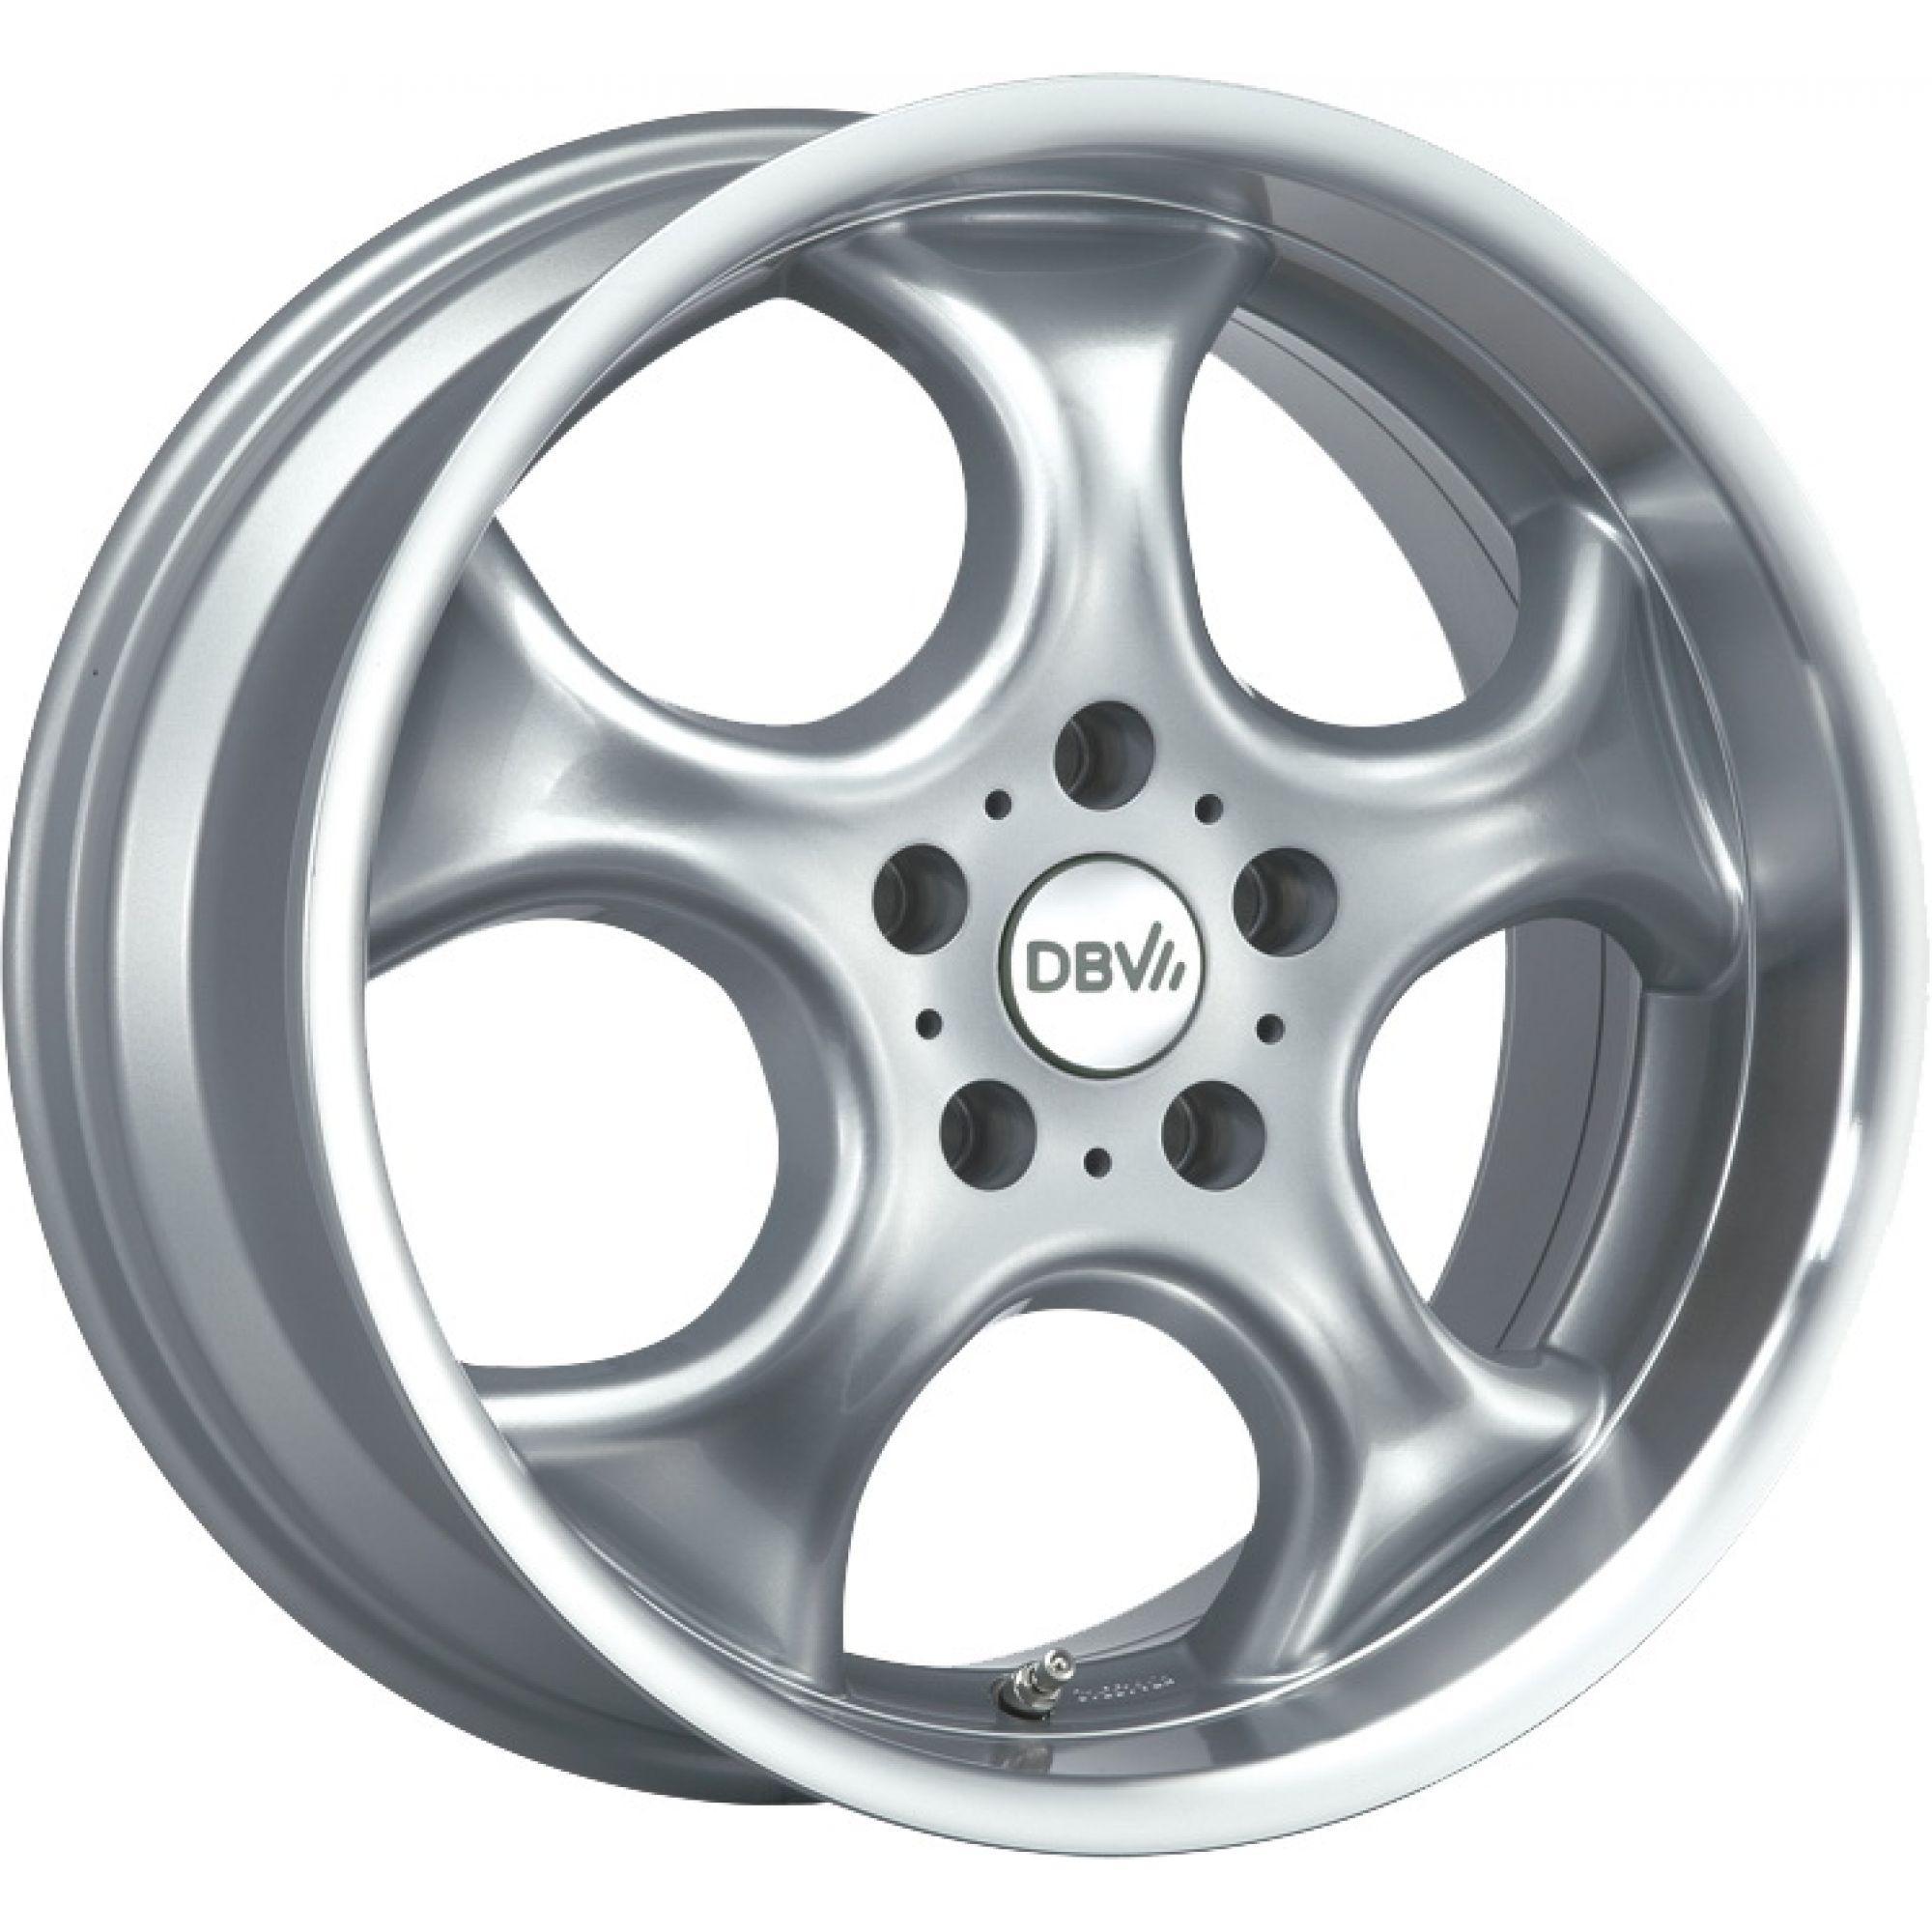 DBV Tahiti silber Horn poliert alloy wheel 5.5xR13 PCD 4x100 ET38 d63.30